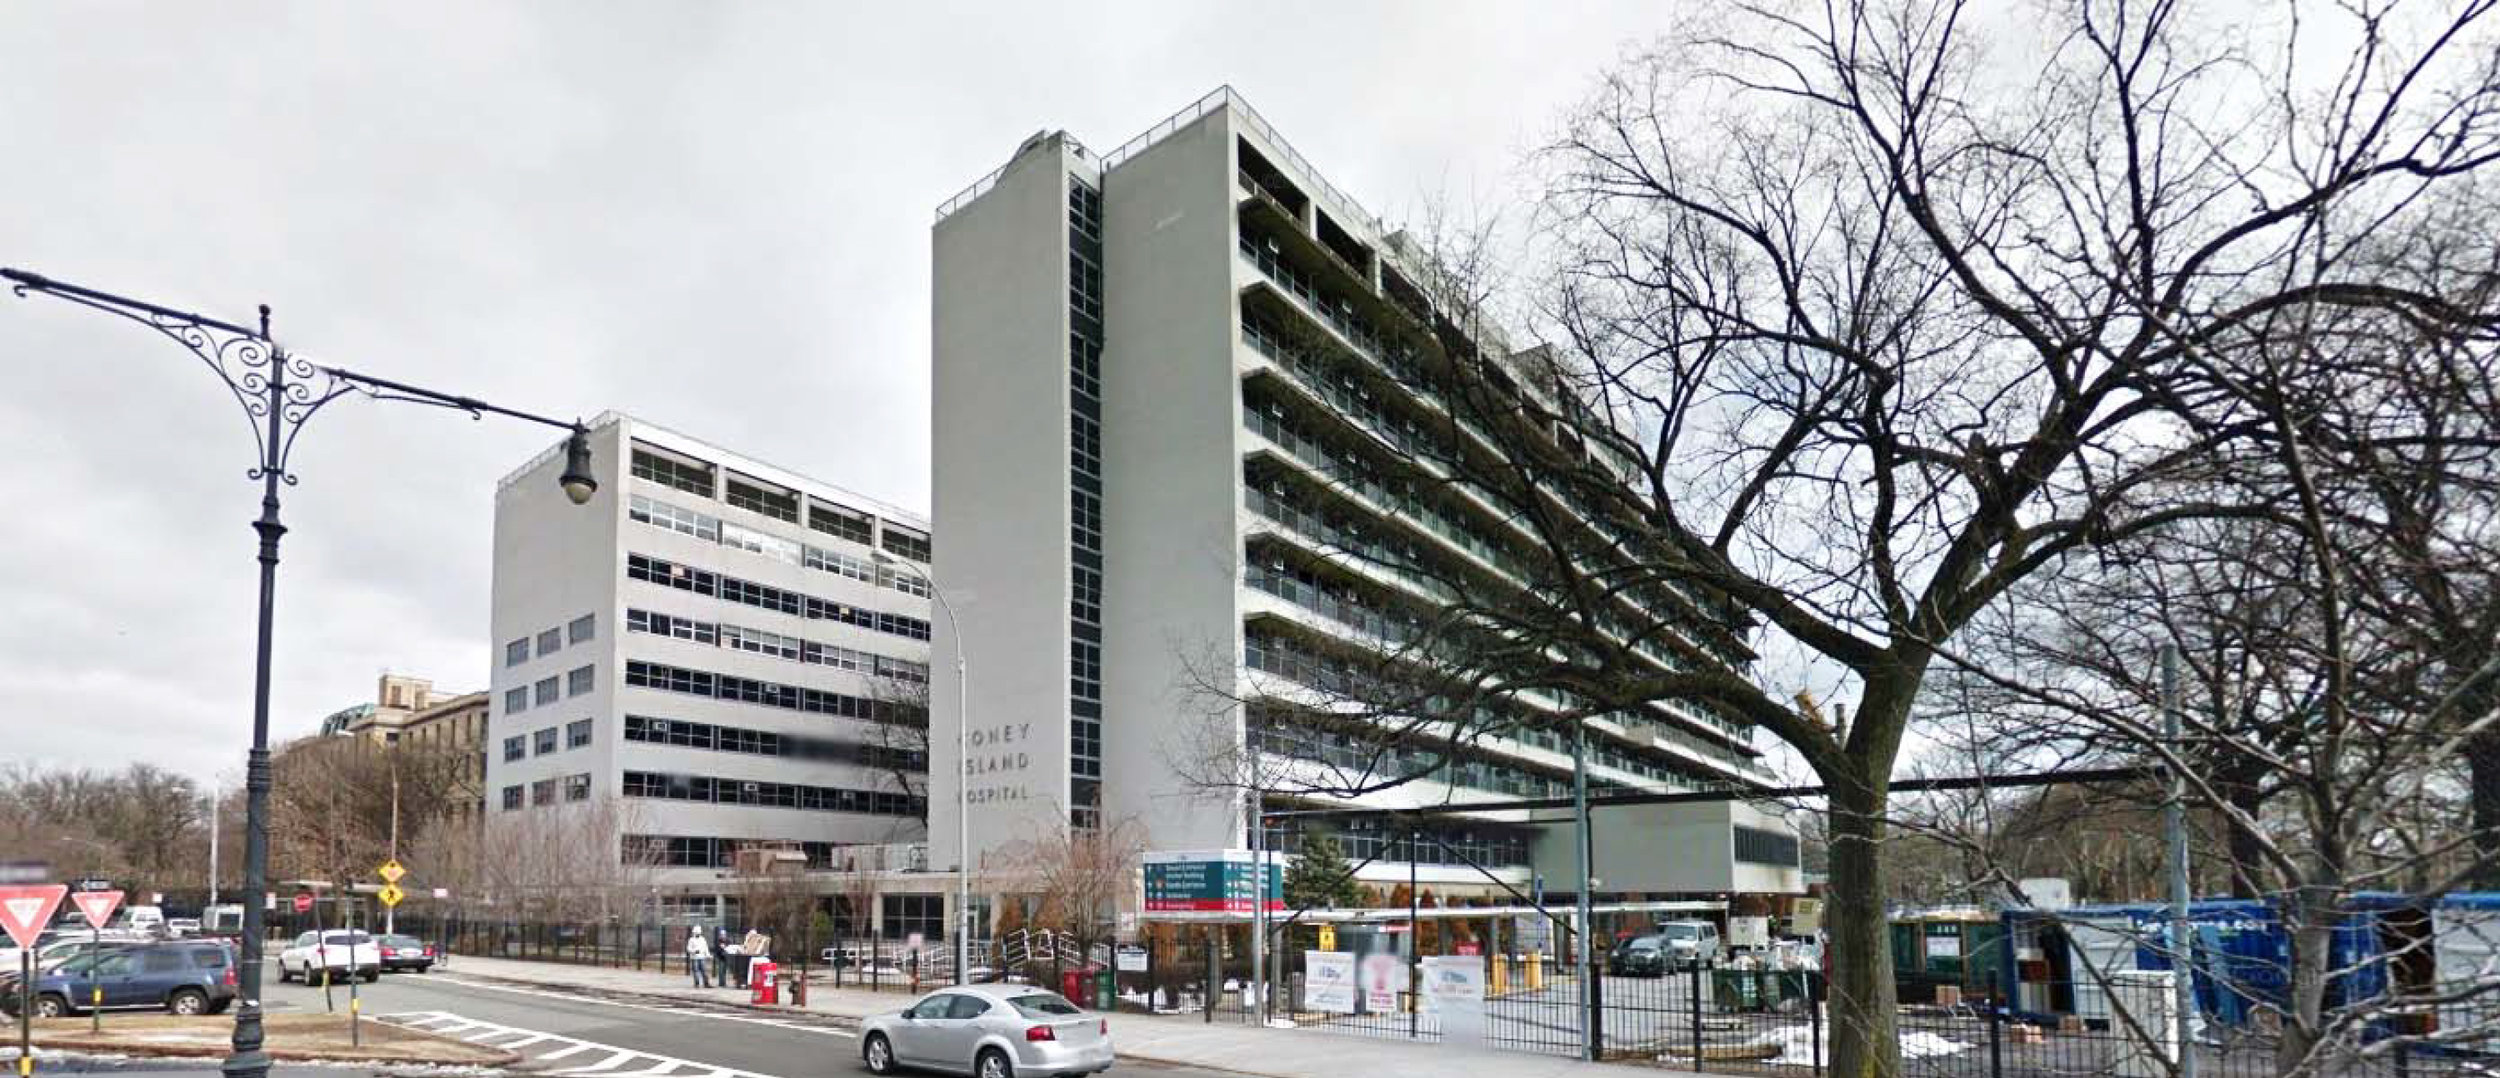 Coney Island Hospital - 2601 Ocean ParkwayBrooklyn, NY 11235